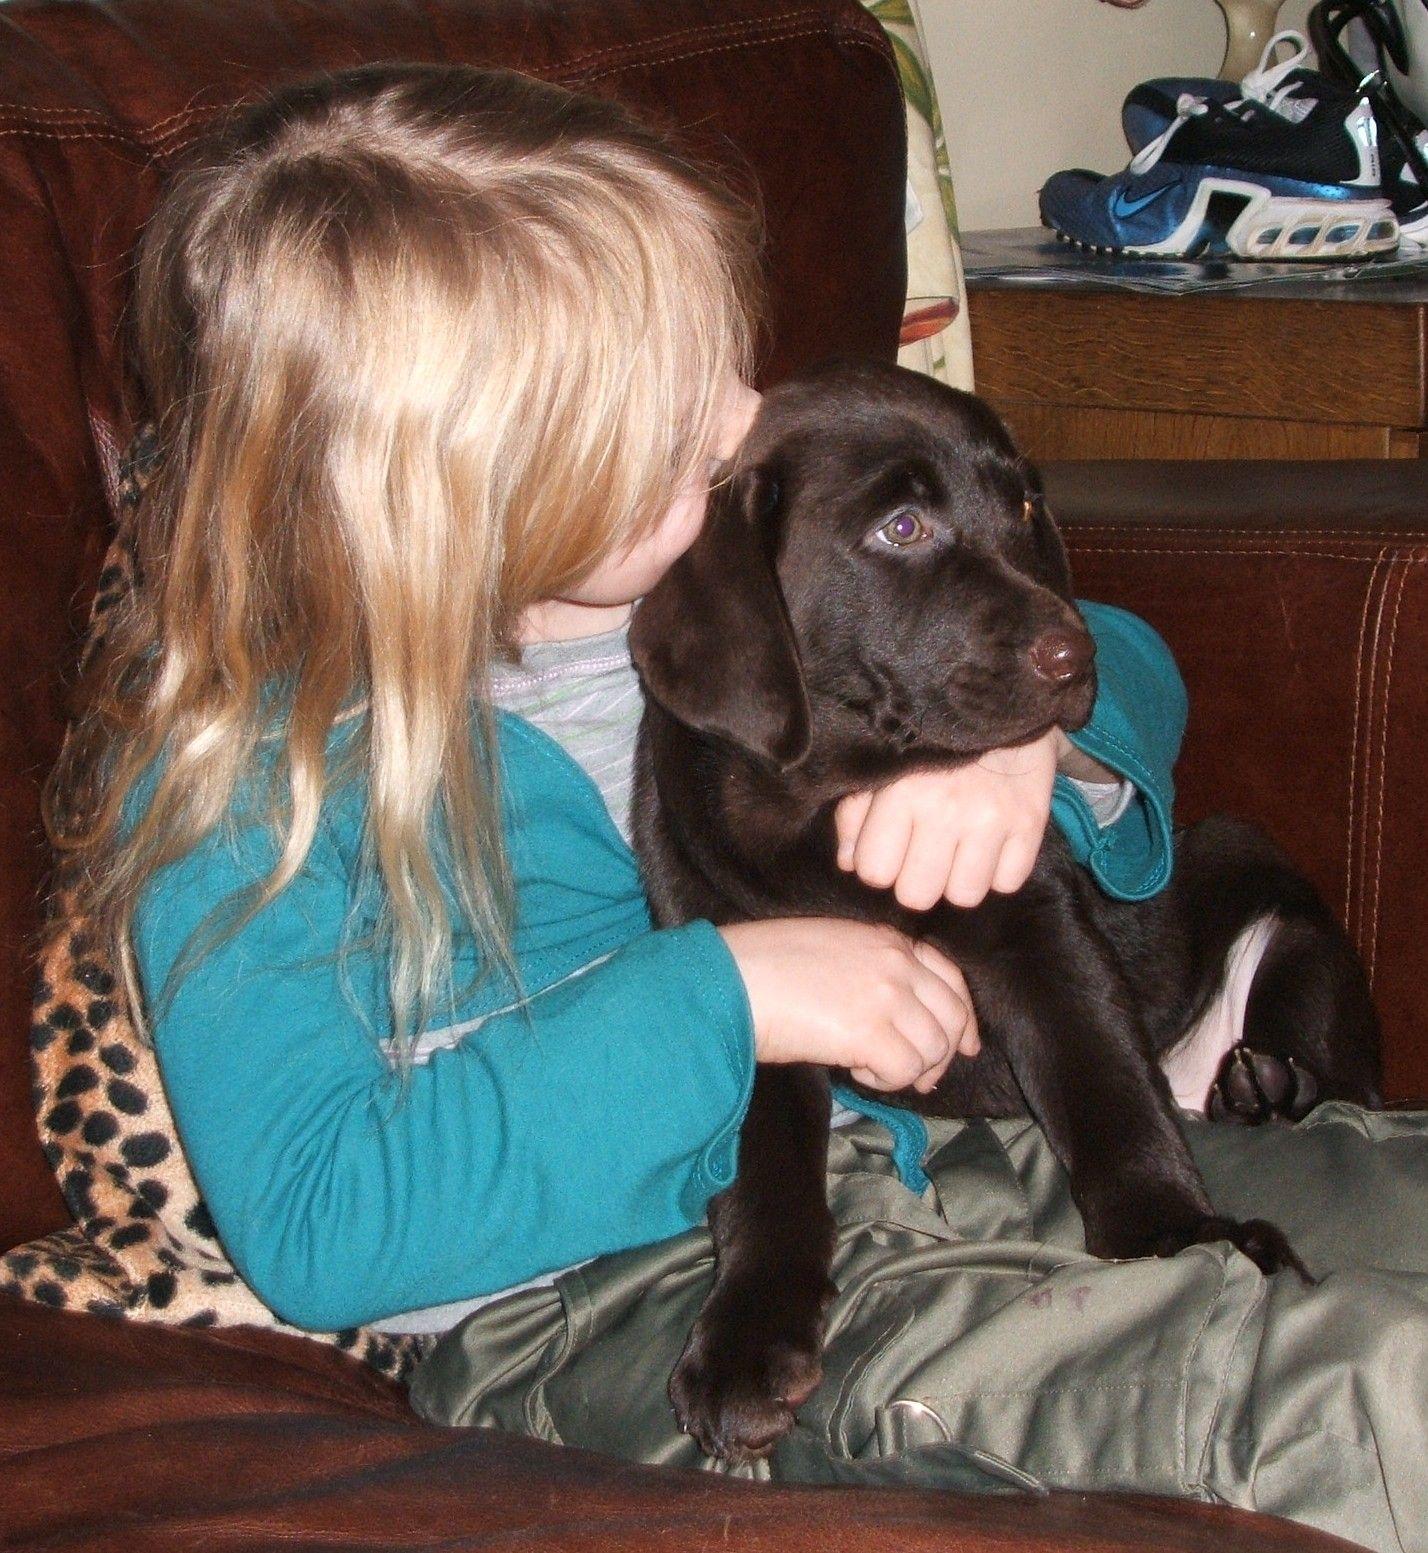 Uk Labrador Breeders Chocolate Labrador Puppies For Sale Labrador Puppies For Sale Labrador Puppy Labrador Breeders